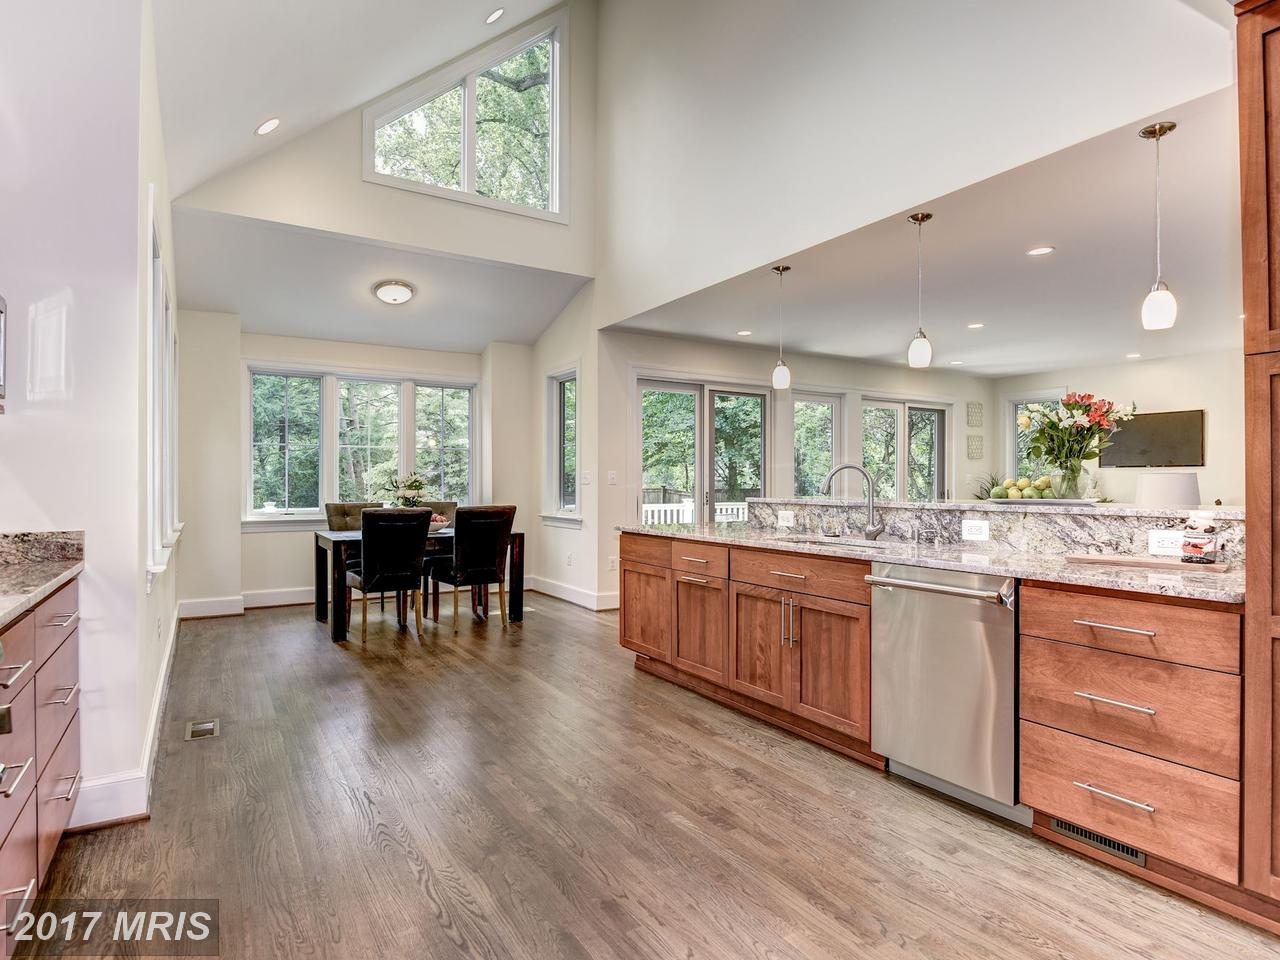 Single Family Home for Sale at Tudor, Detached - WASHINGTON, DC 4550 KLINGLE ST NW Washington, District Of Columbia,20016 United States